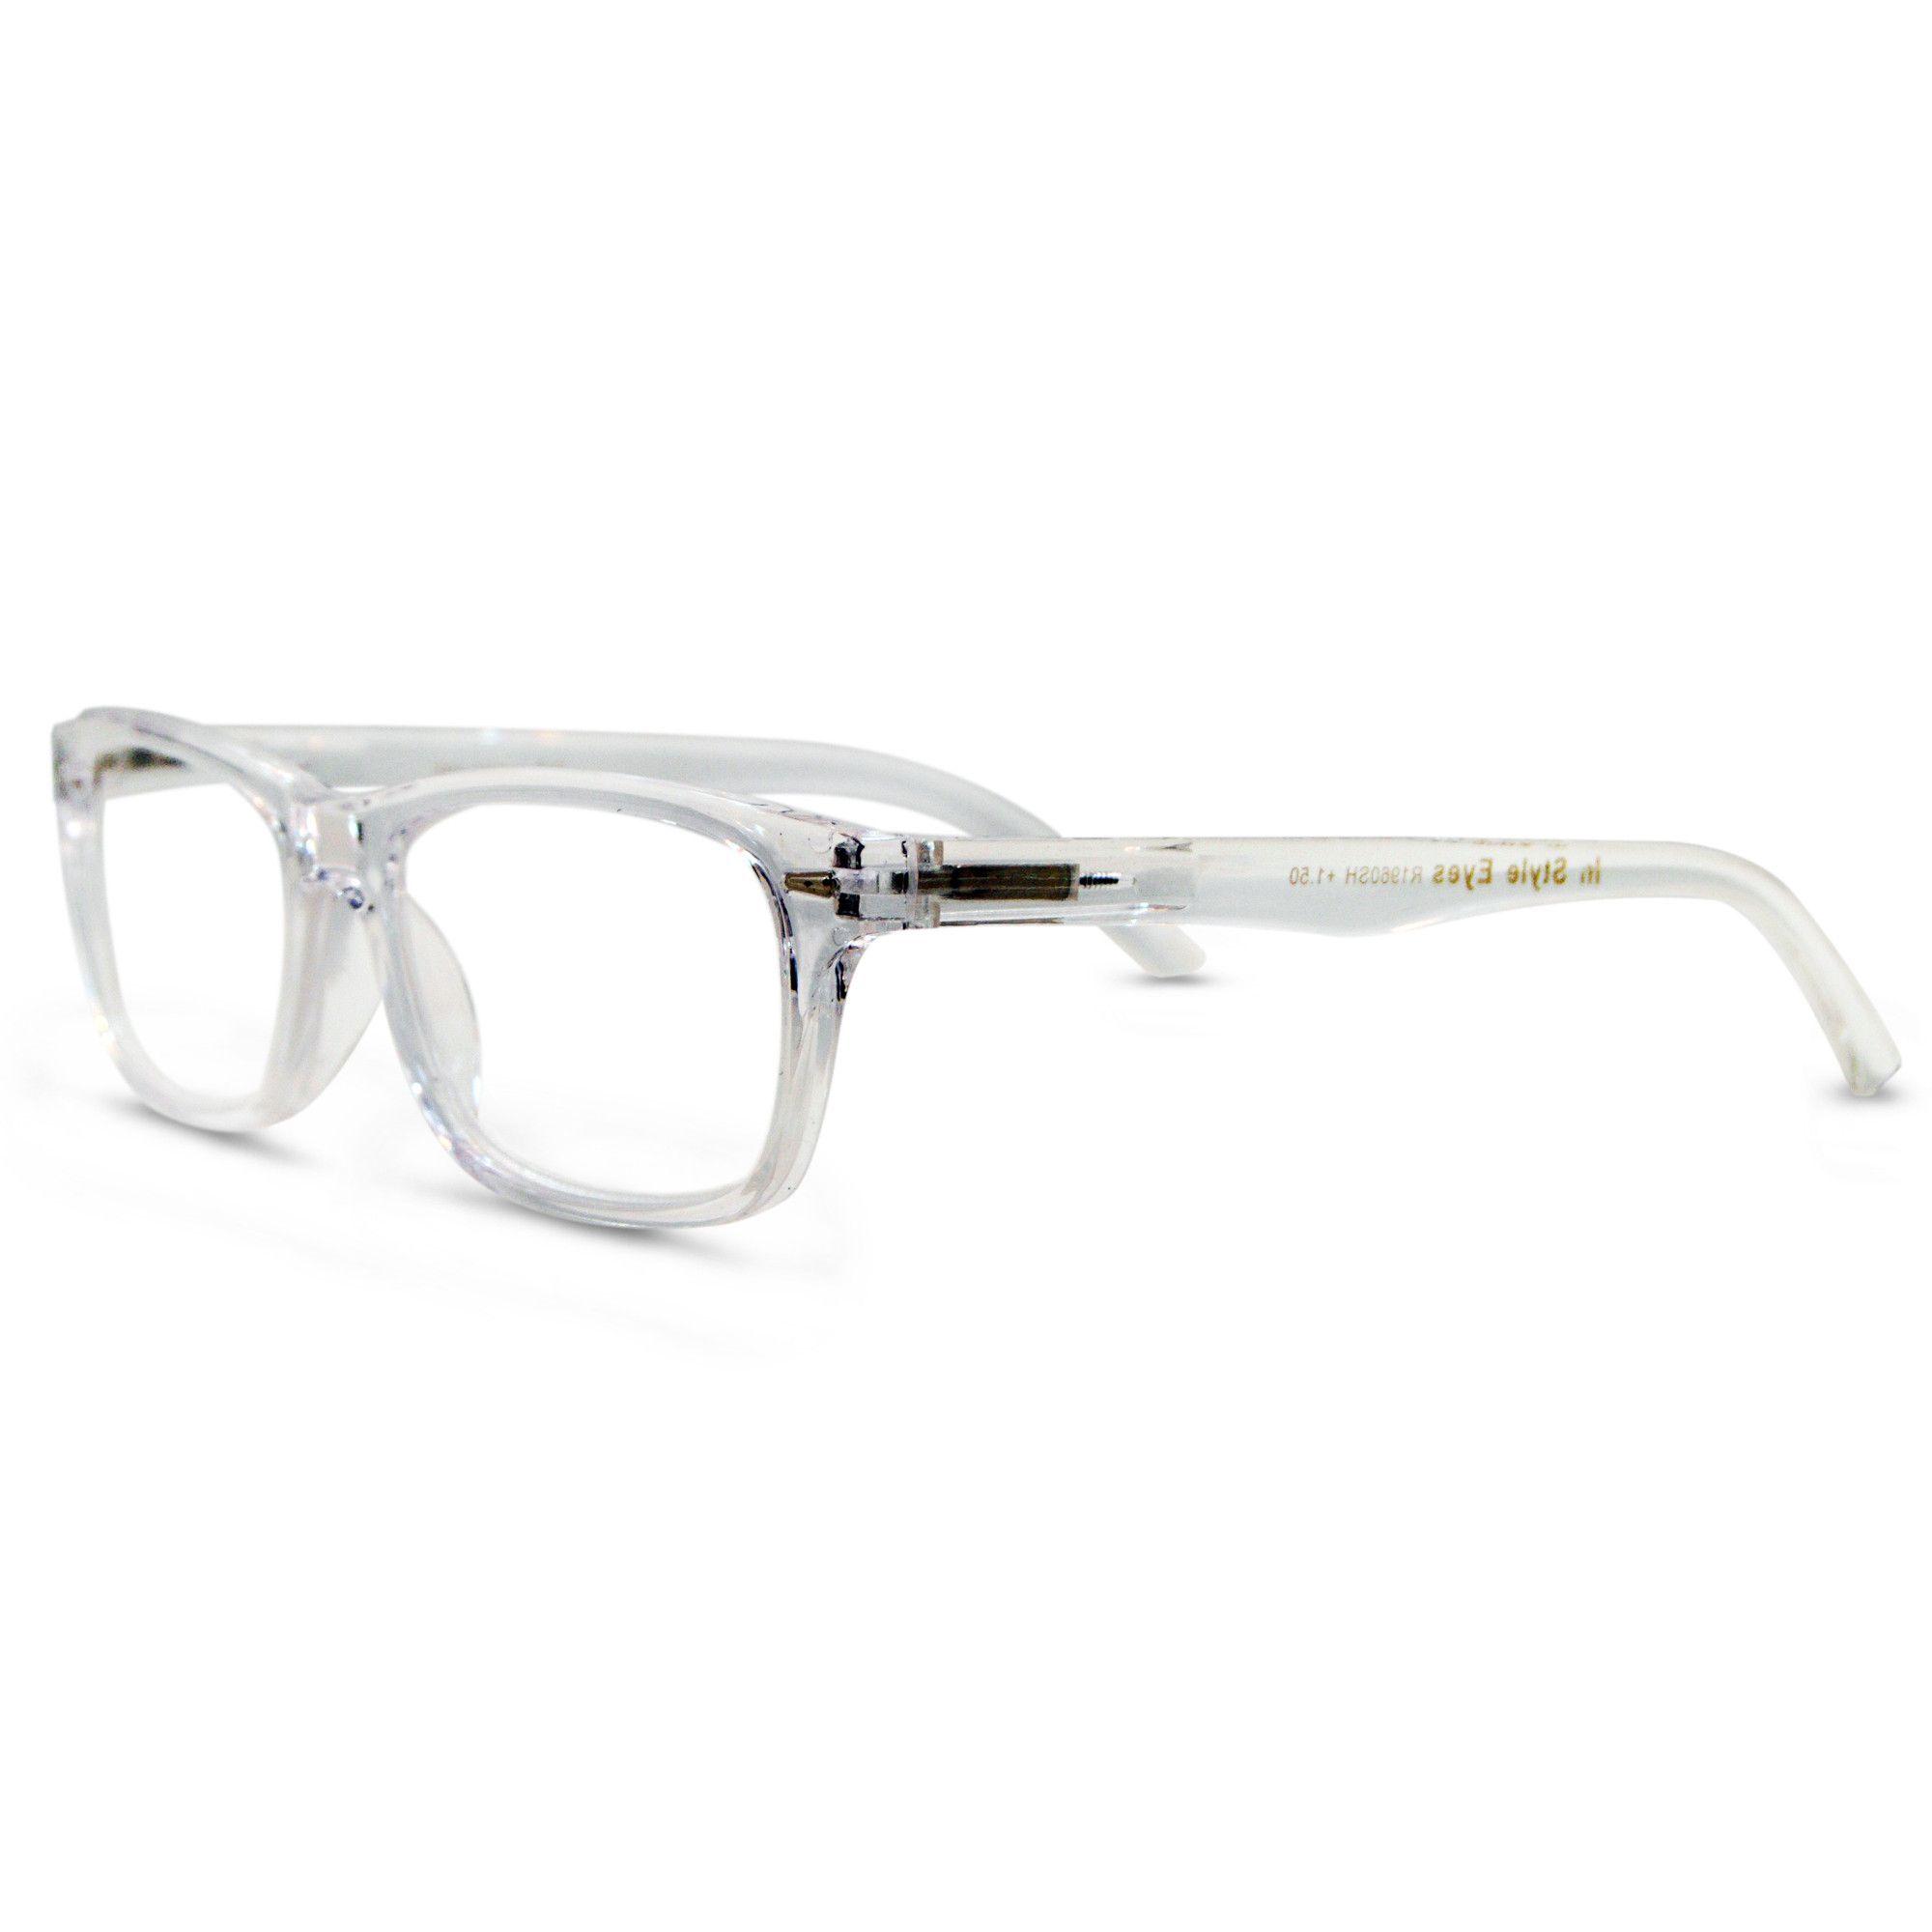 f49784ede1b In Style Eyes Seymore Wayfarer Reading Glasses. Not Bifocals ...